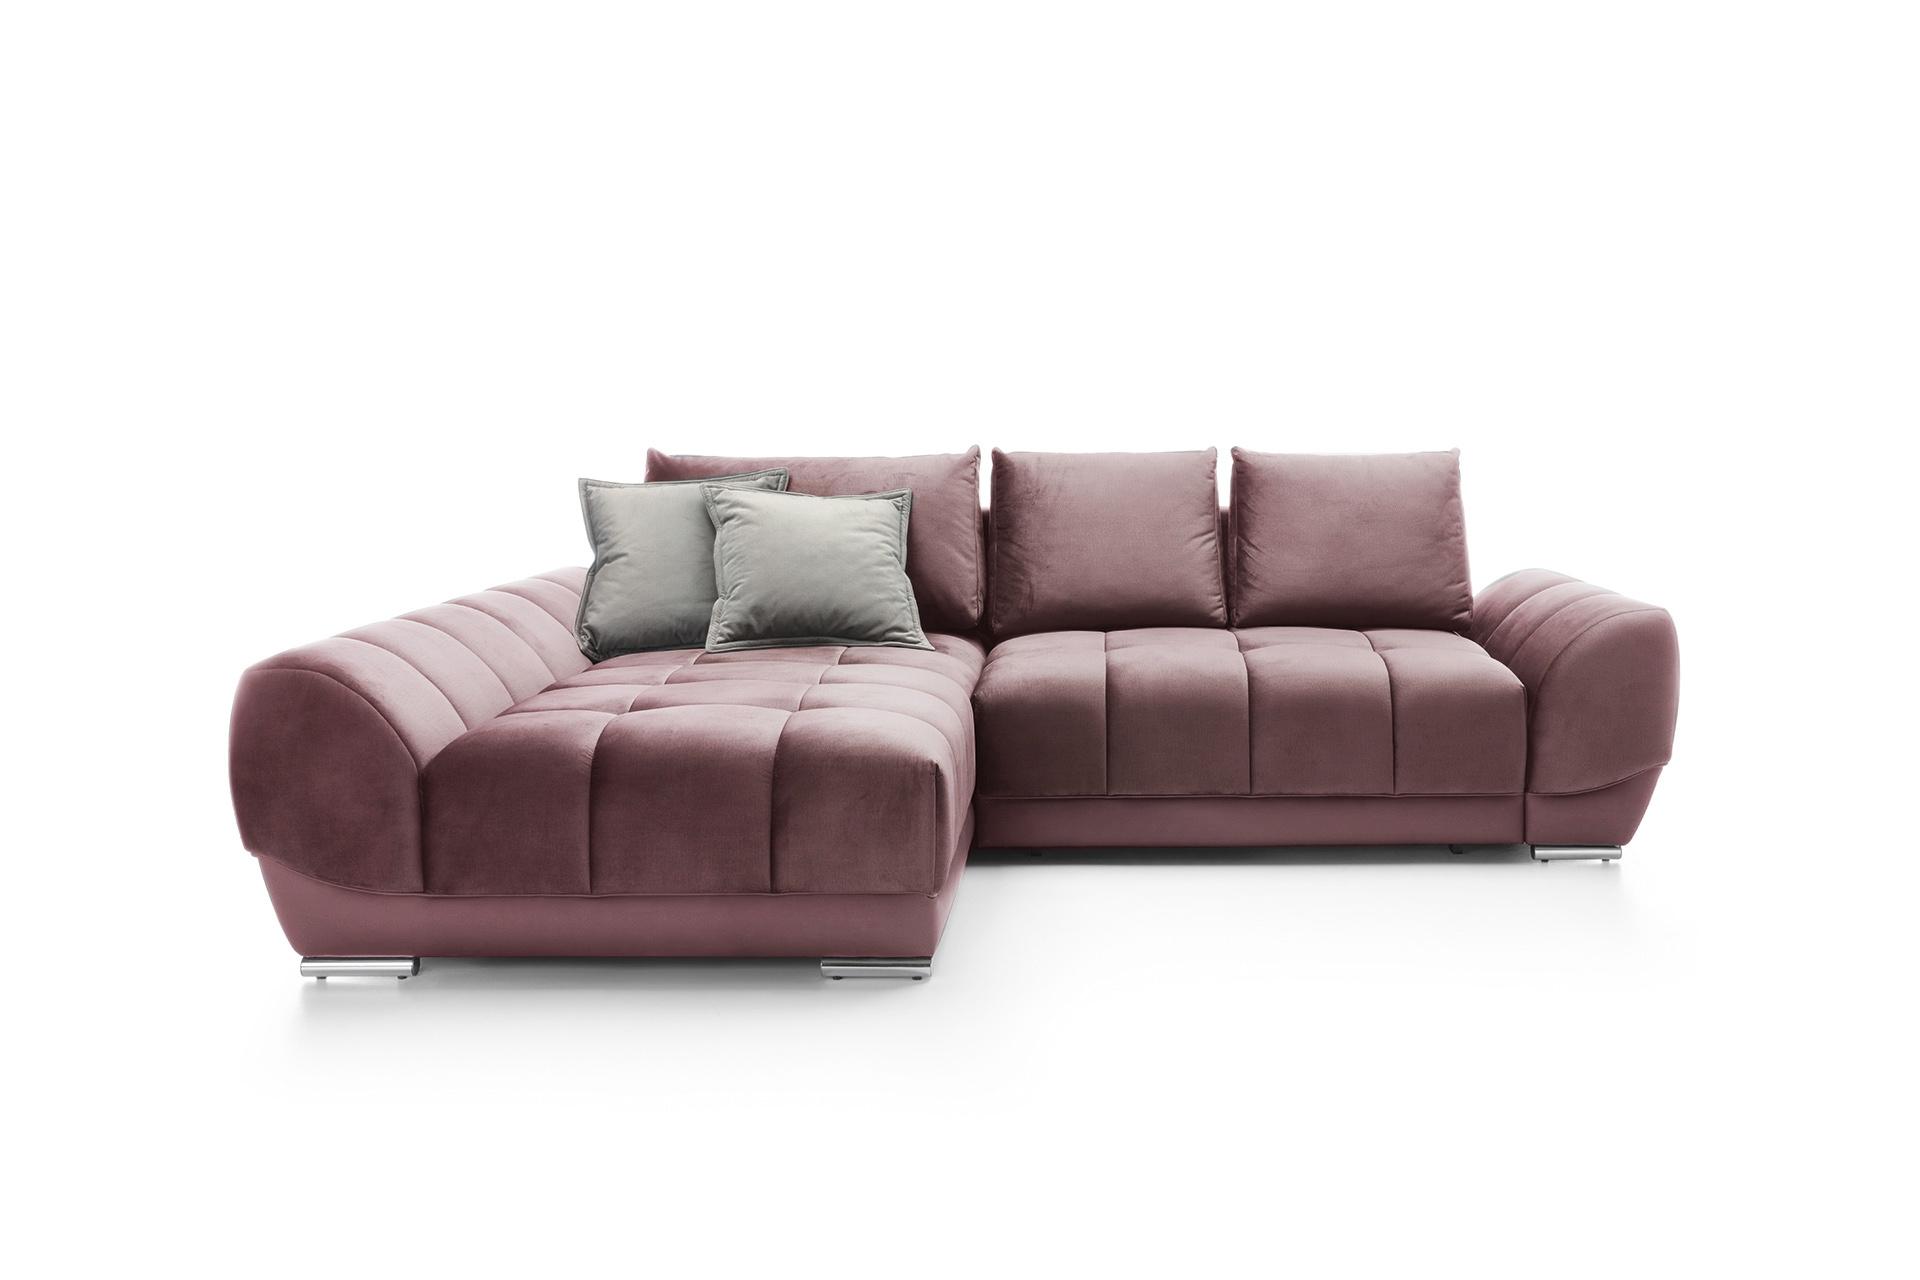 Coltar extensibil cu lada de depozitare, cu sezlong pe stanga Violet Dark Pink, l290xA192xH76 cm imagine